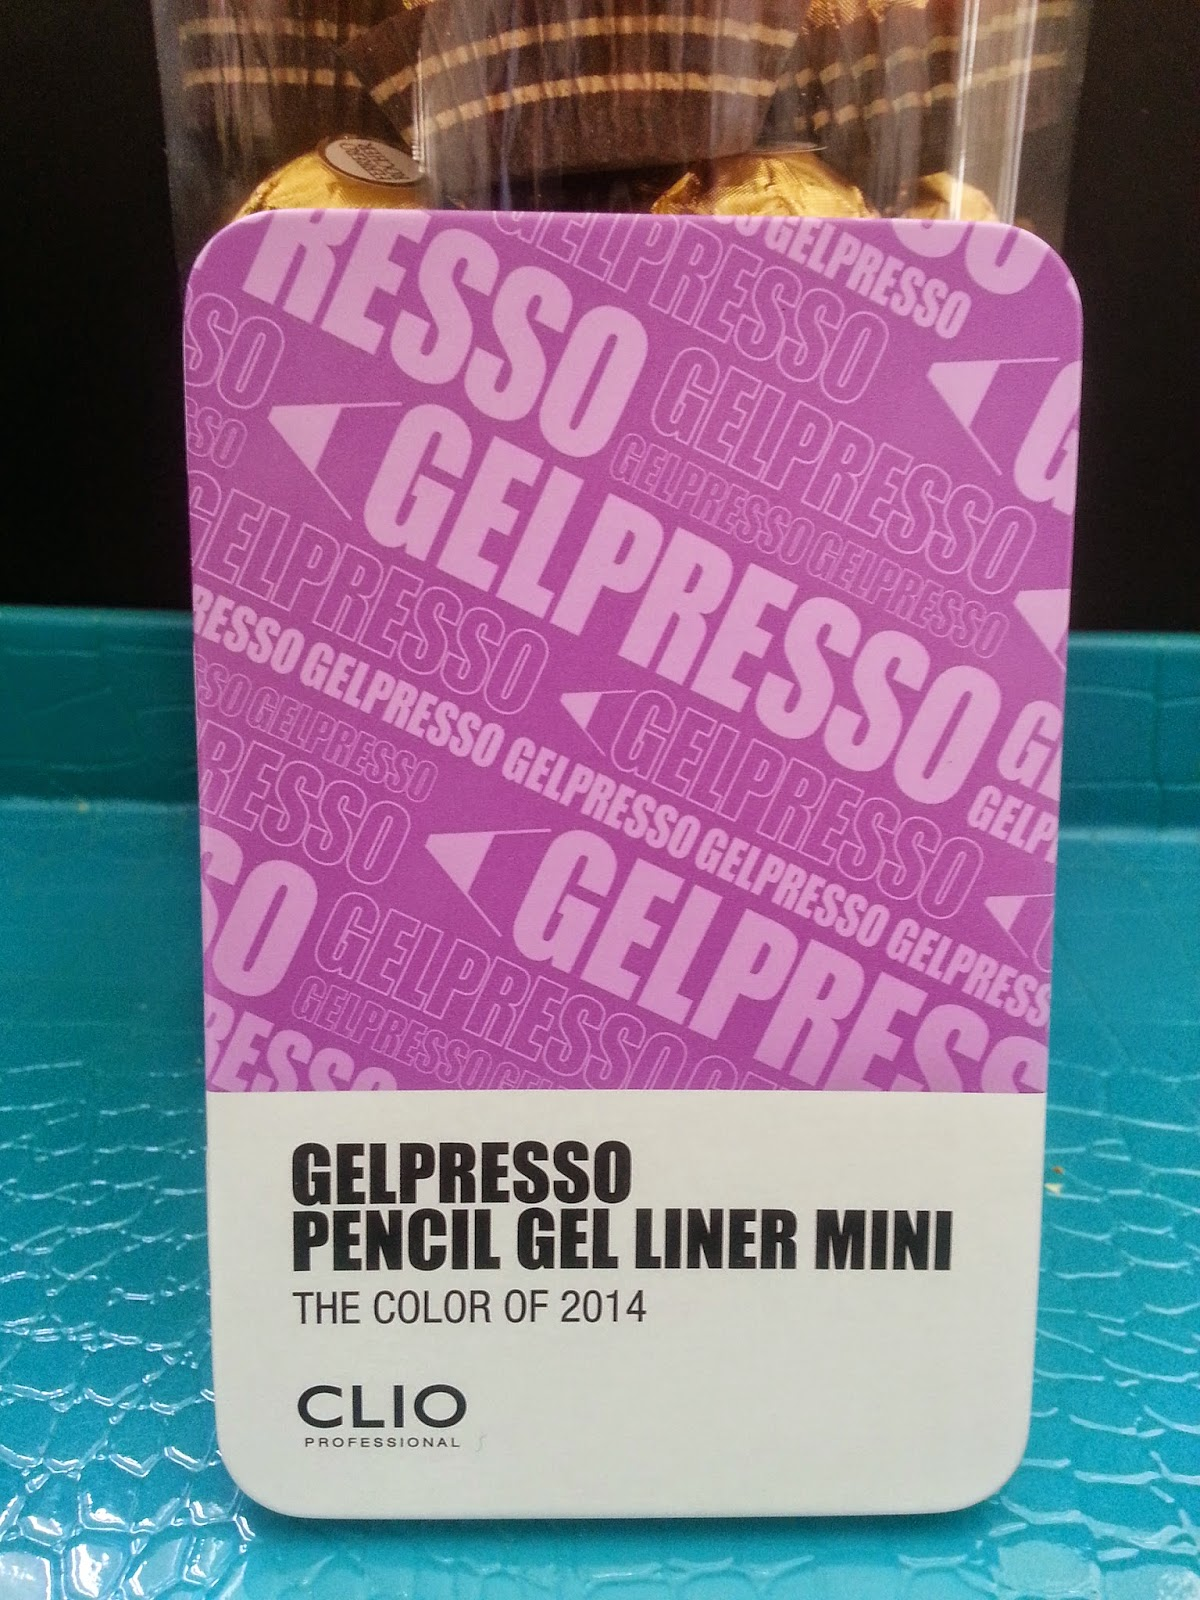 Clio Gelpresso Pencil Gel Liner Mini